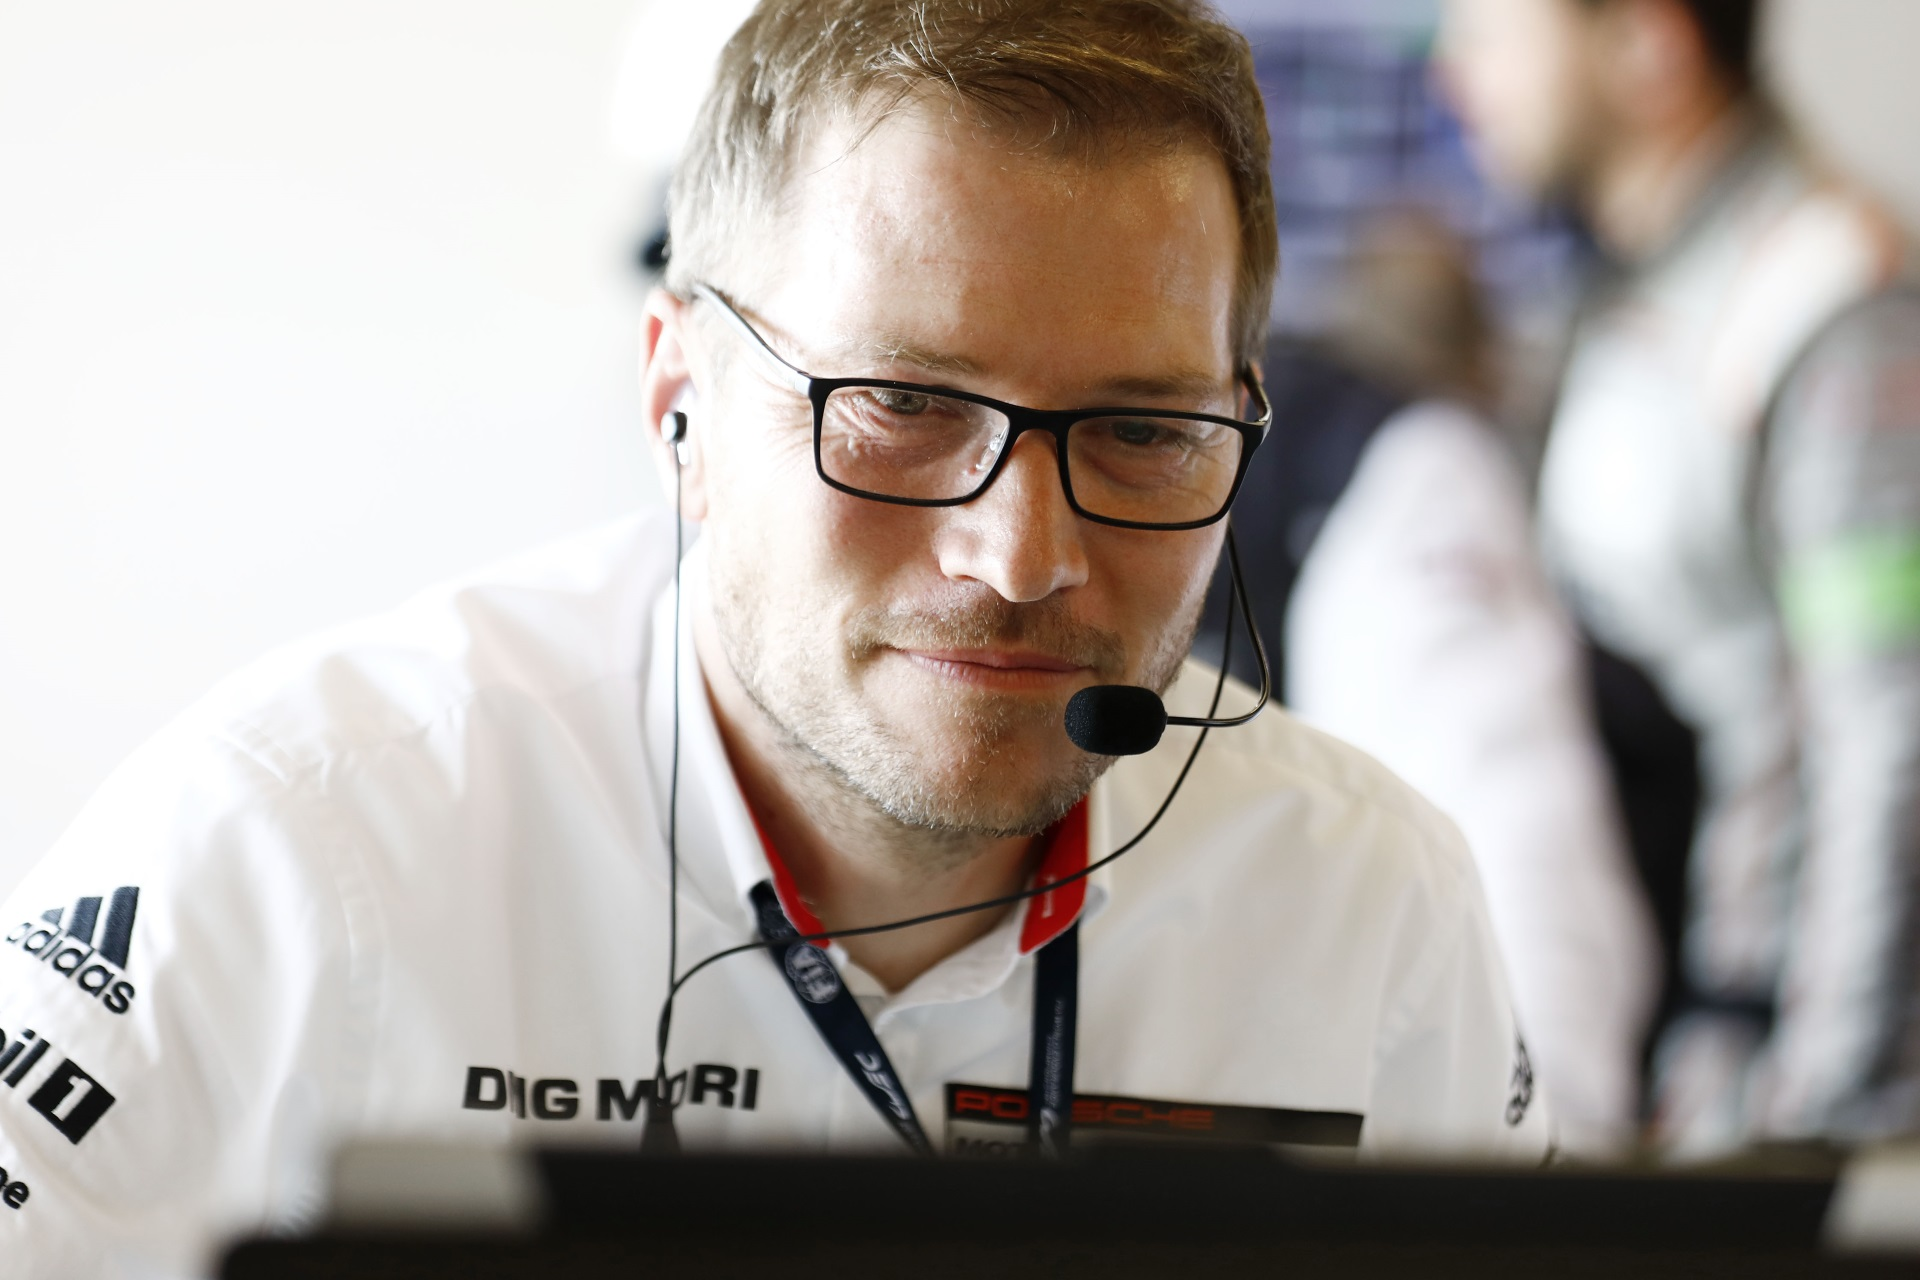 Андреас Зайдль, руководитель команды